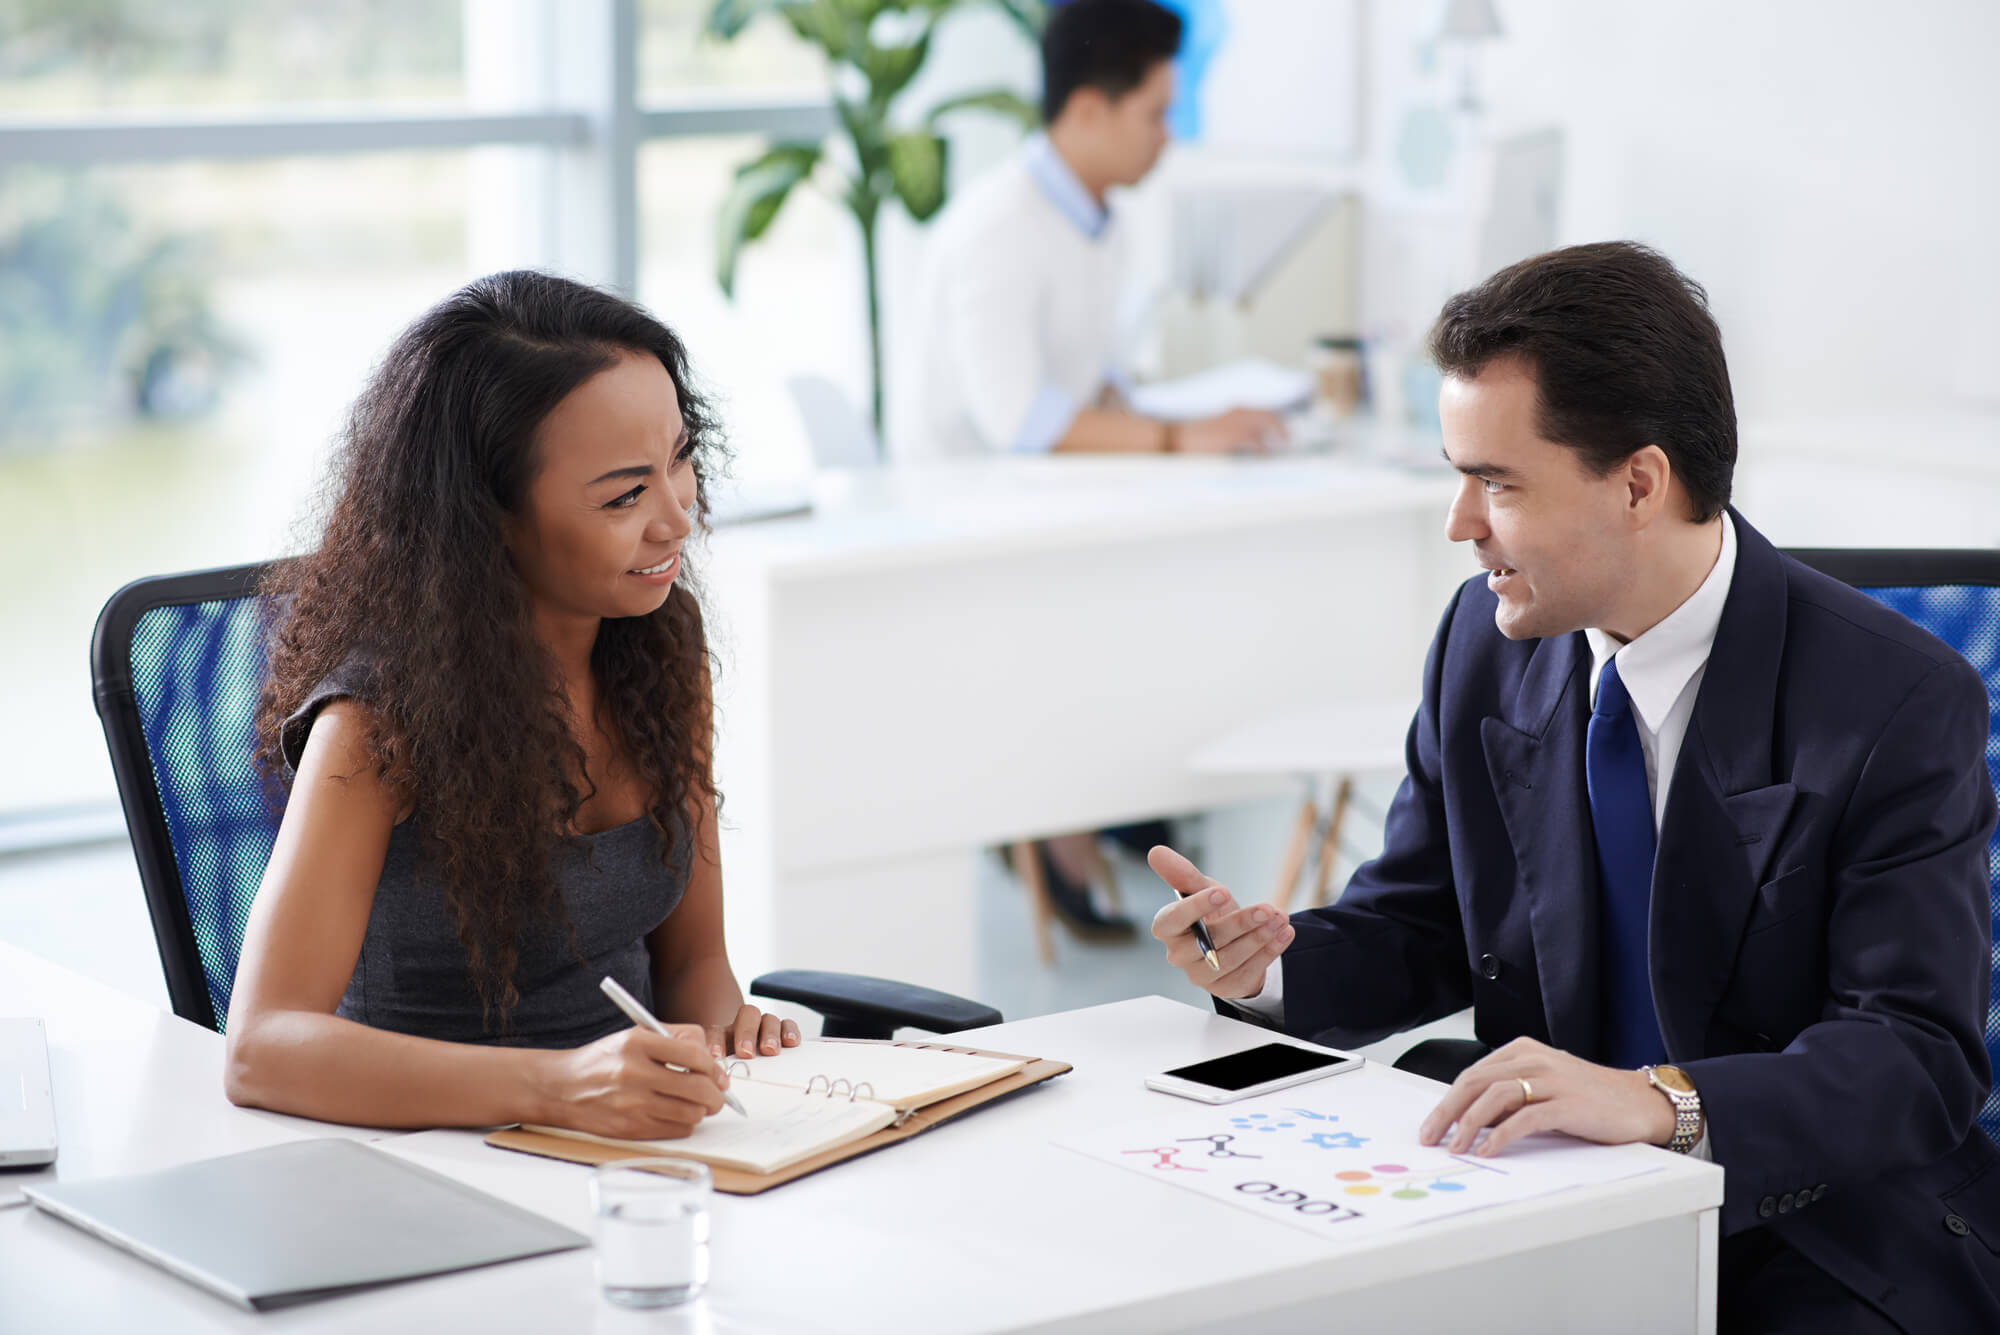 vendas consultivas de alta performance